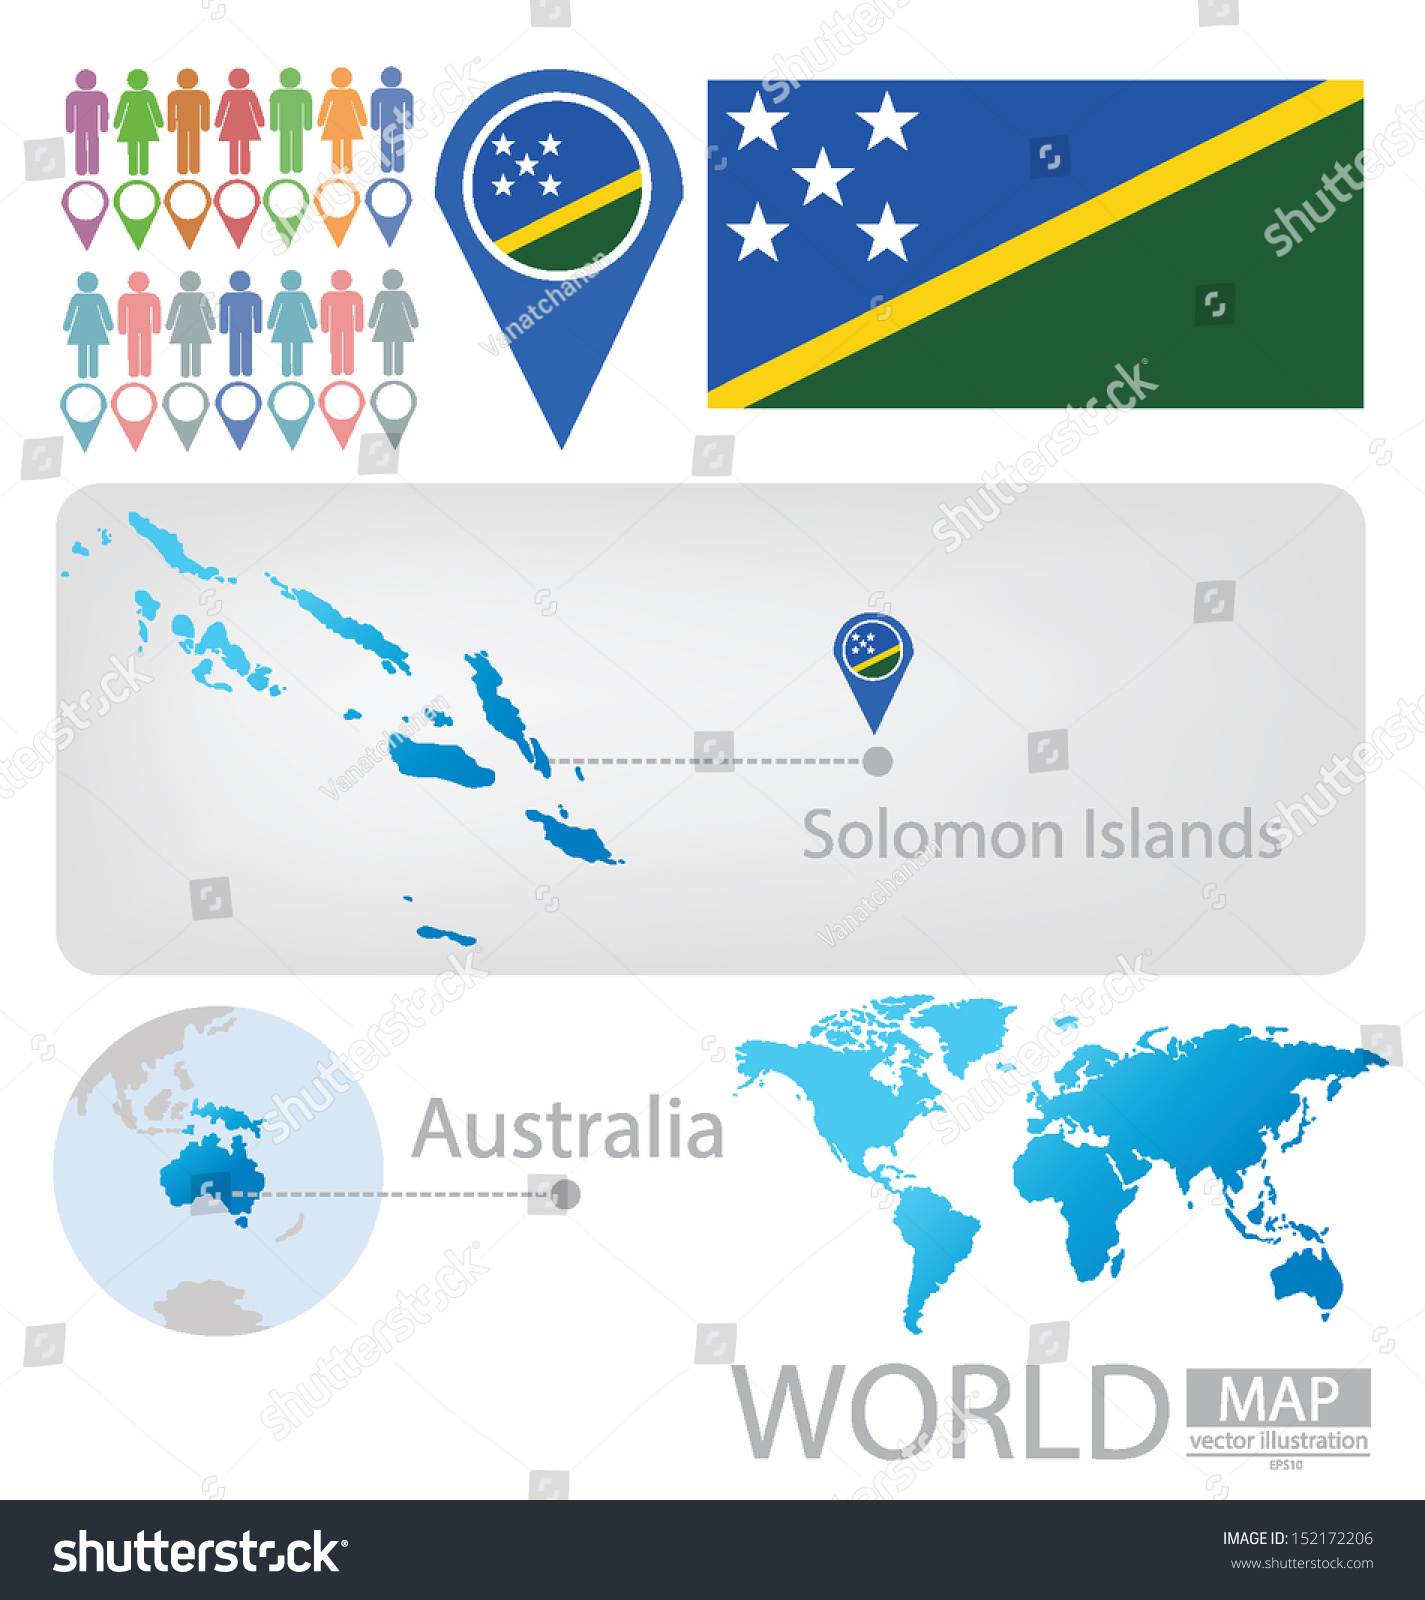 Solomon Islands World Map.Solomon Islands Australia Flag World Map Stock Vector Royalty Free